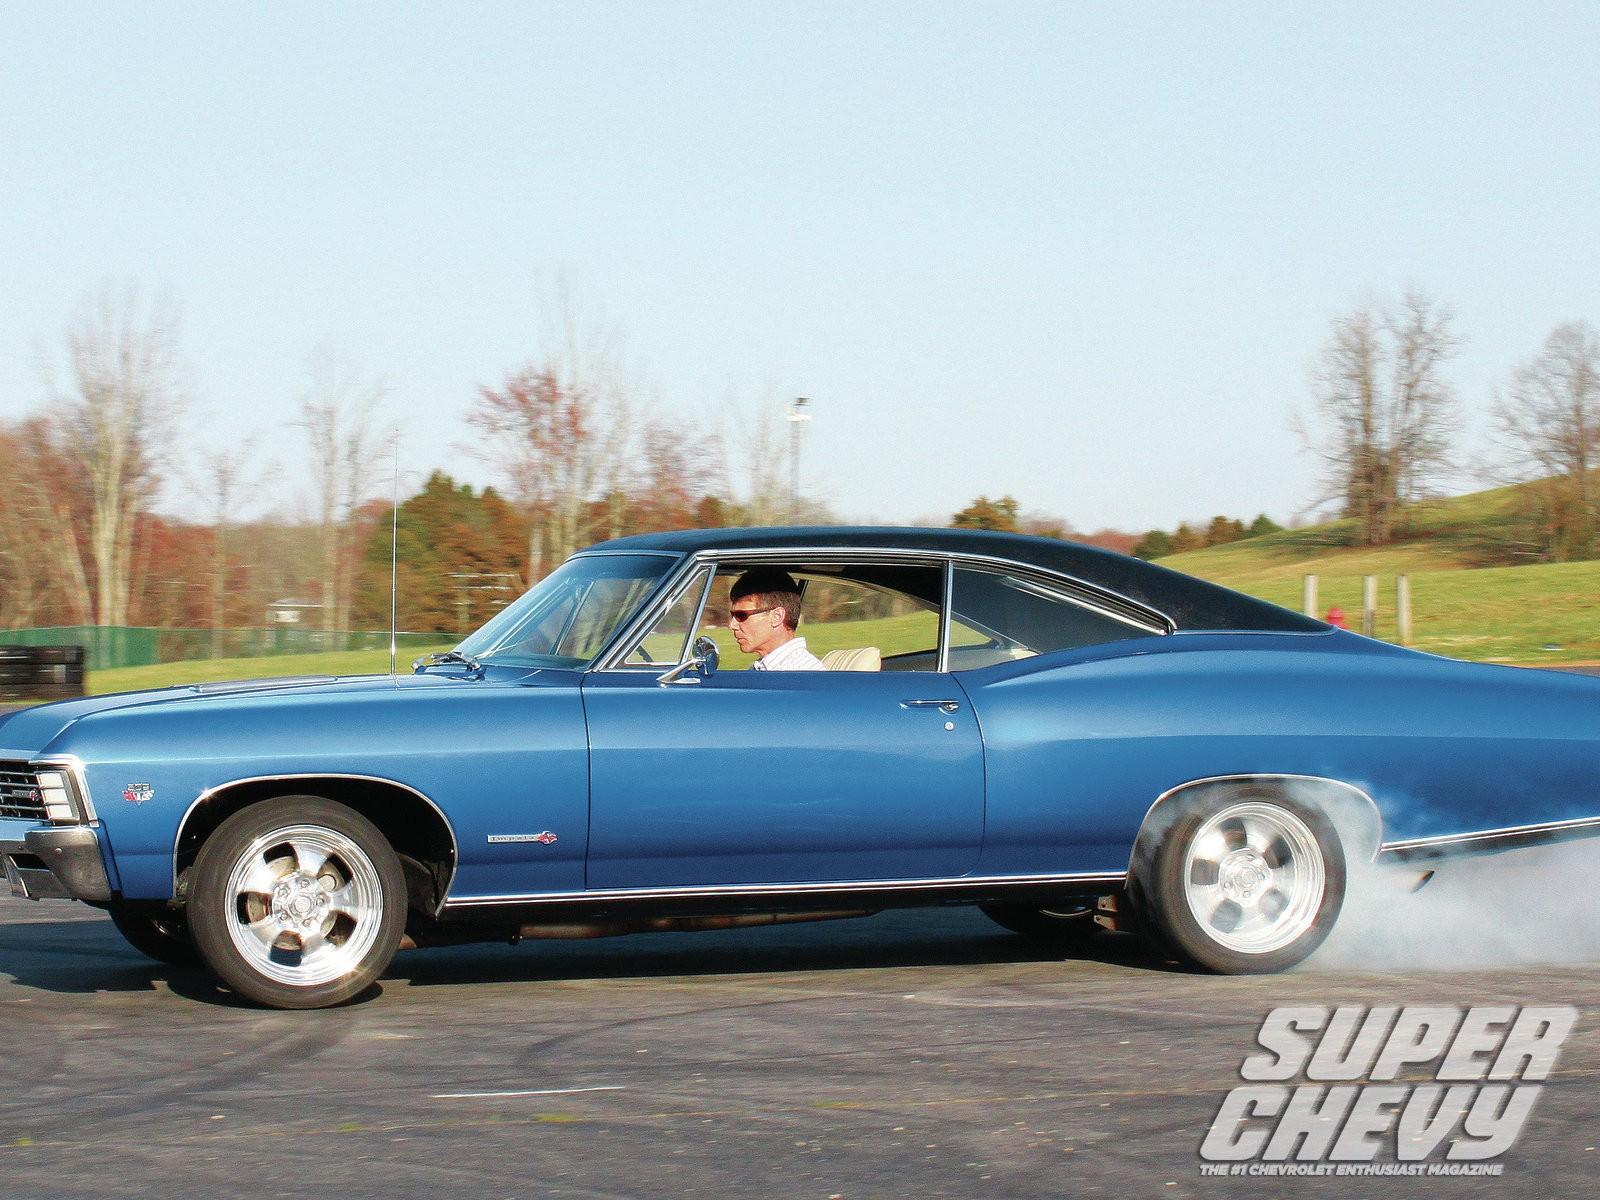 Cars Muscle Cars Burnout Classic Cars Impala Super Chevy Magazine